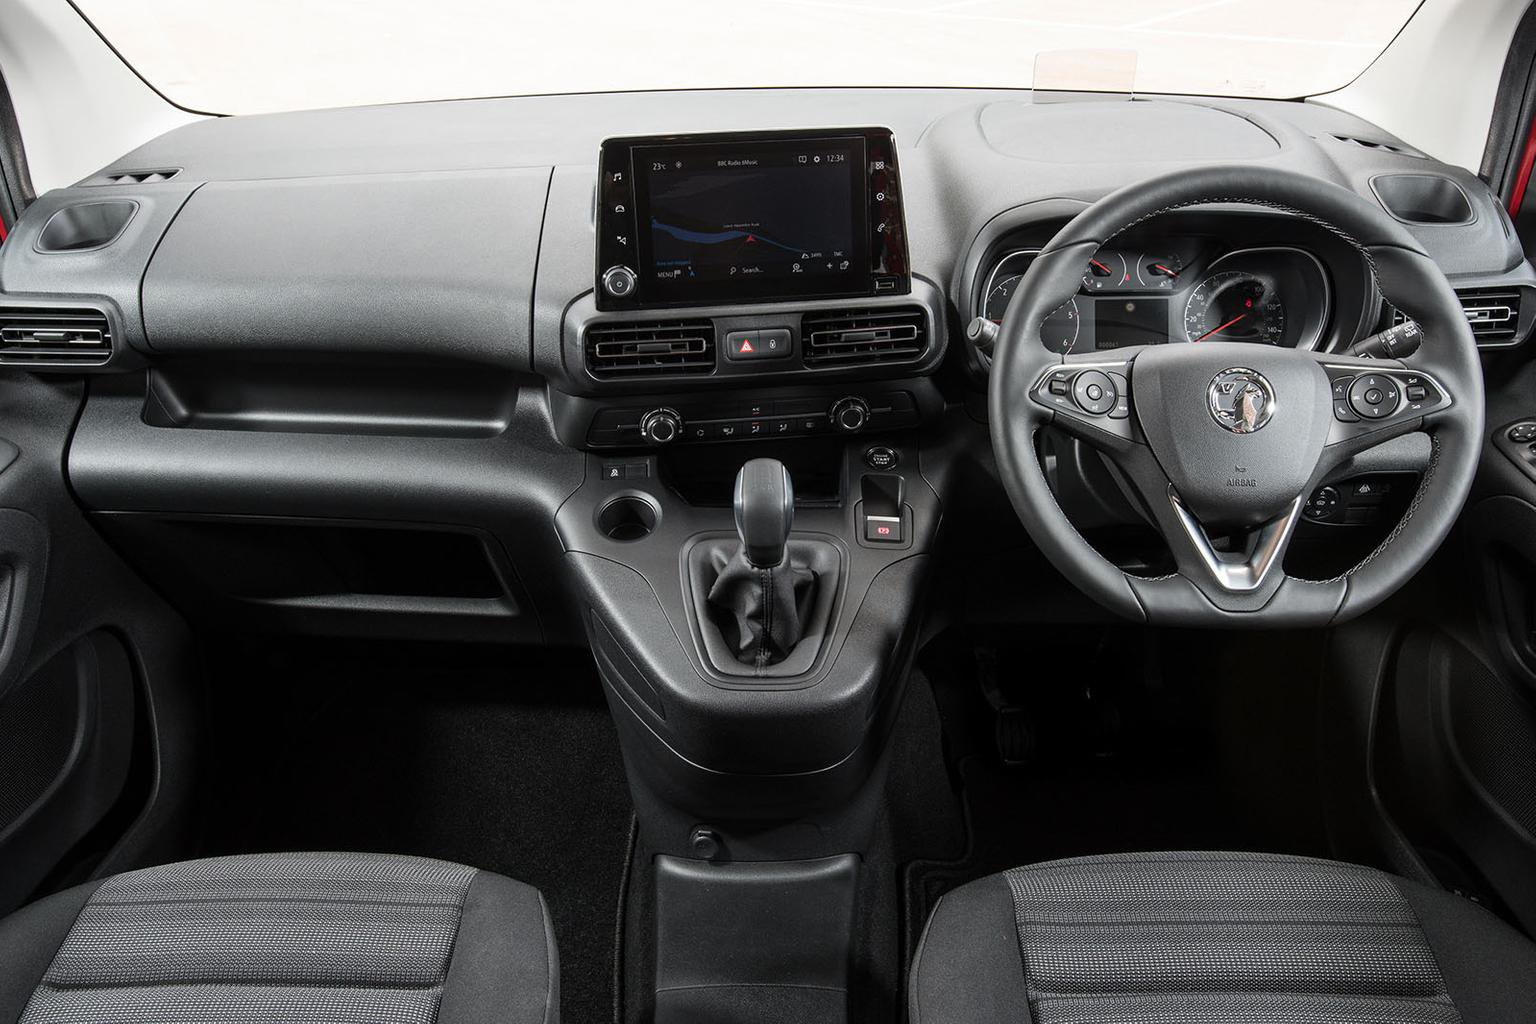 Vauxhall Combo Life Interior Sat Nav Dashboard What Car